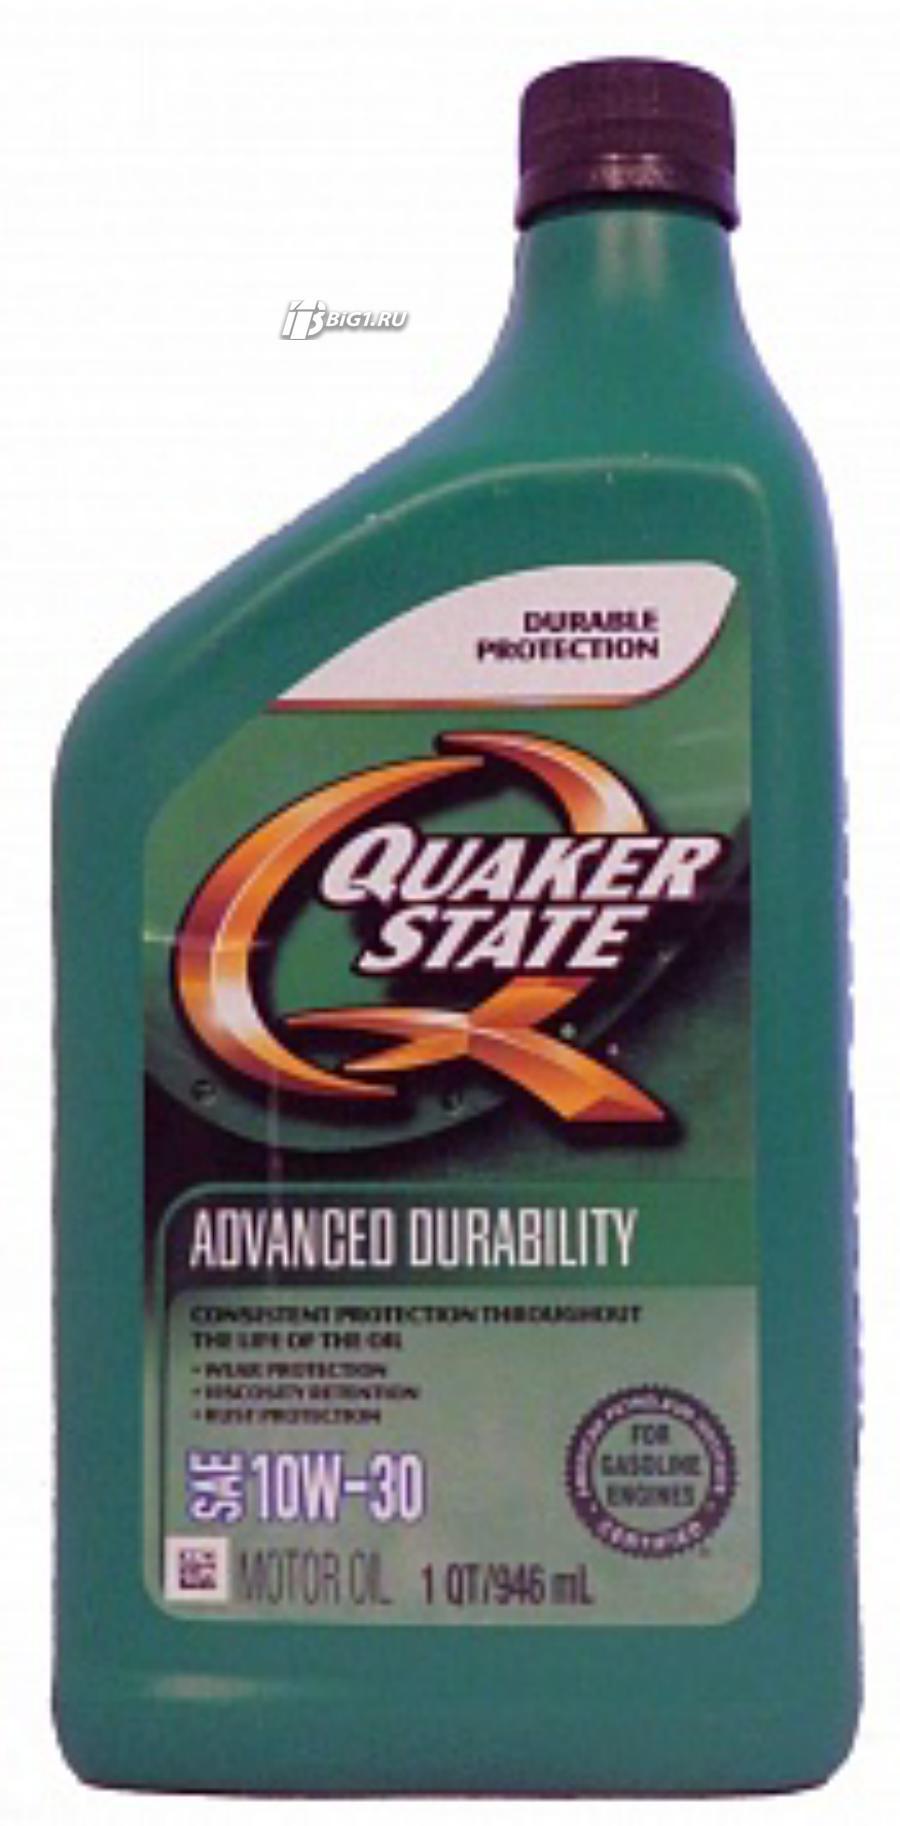 QUAKER STATE Advanced Durability 10W-30